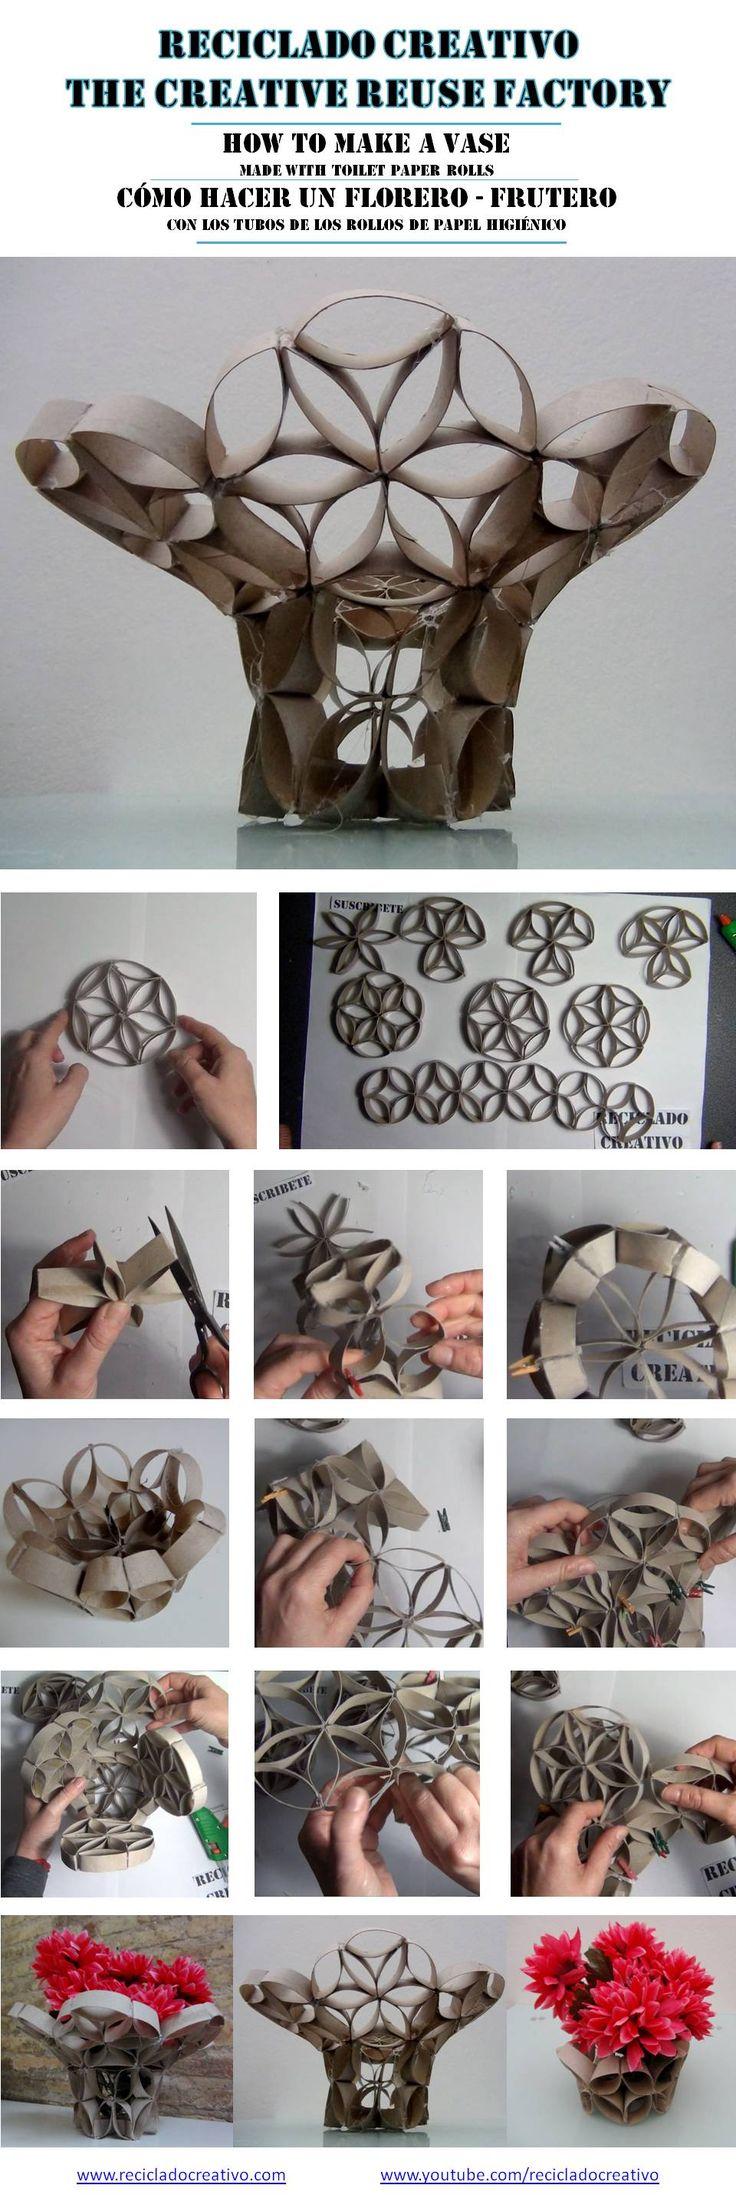 C mo hacer un florero con tubos de rollo de papel for Como decorar un rollo de papel higienico